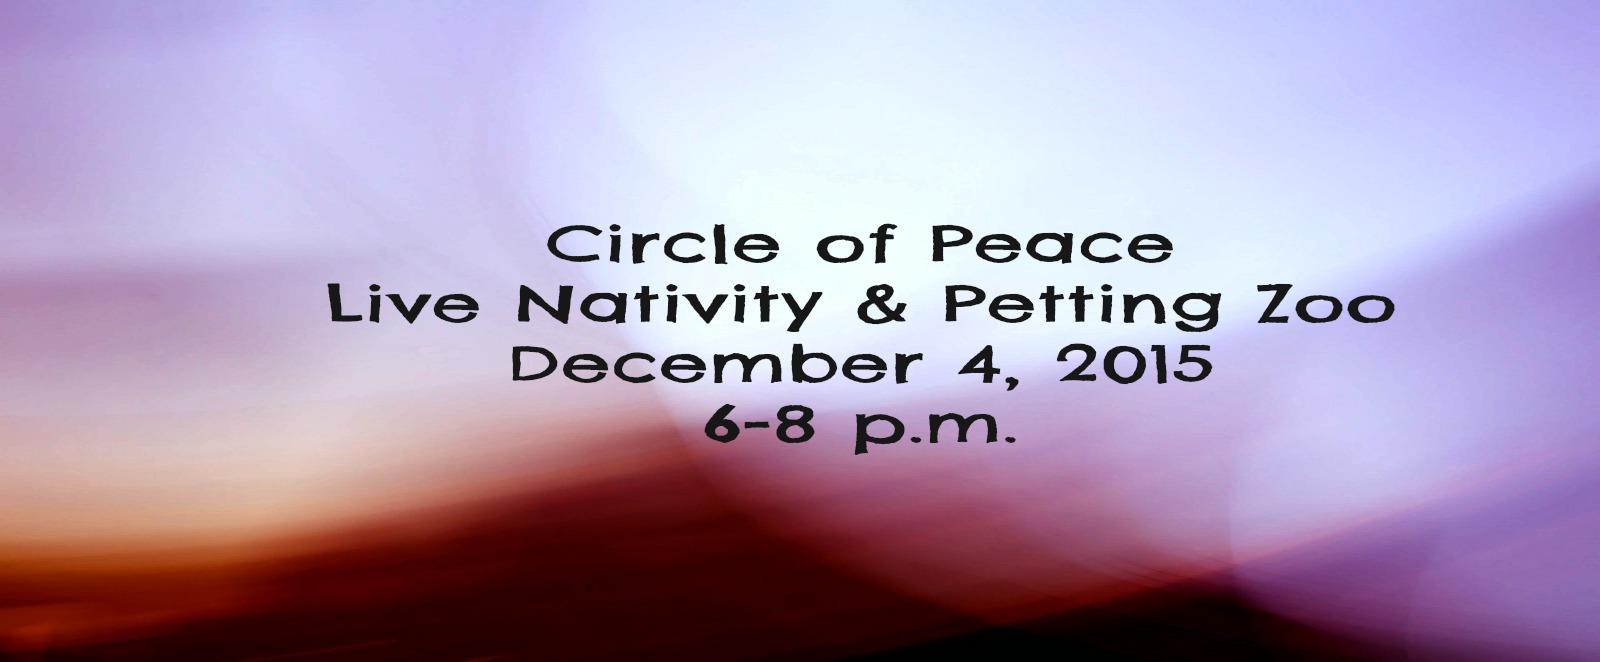 Live-Nativity-Slider-smaller-font